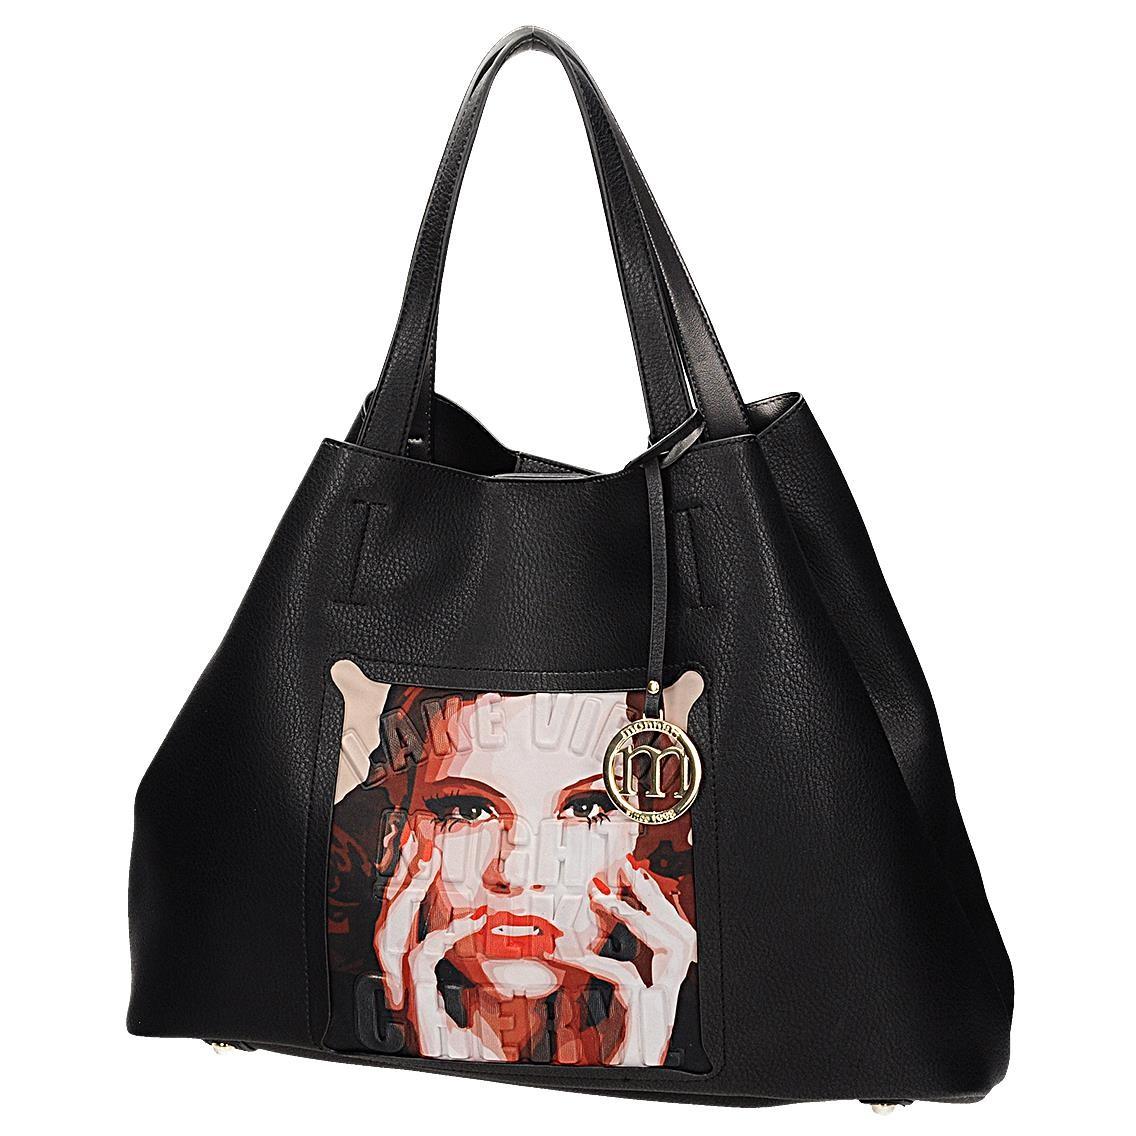 Monnari torebka damska czarna shopperka worek